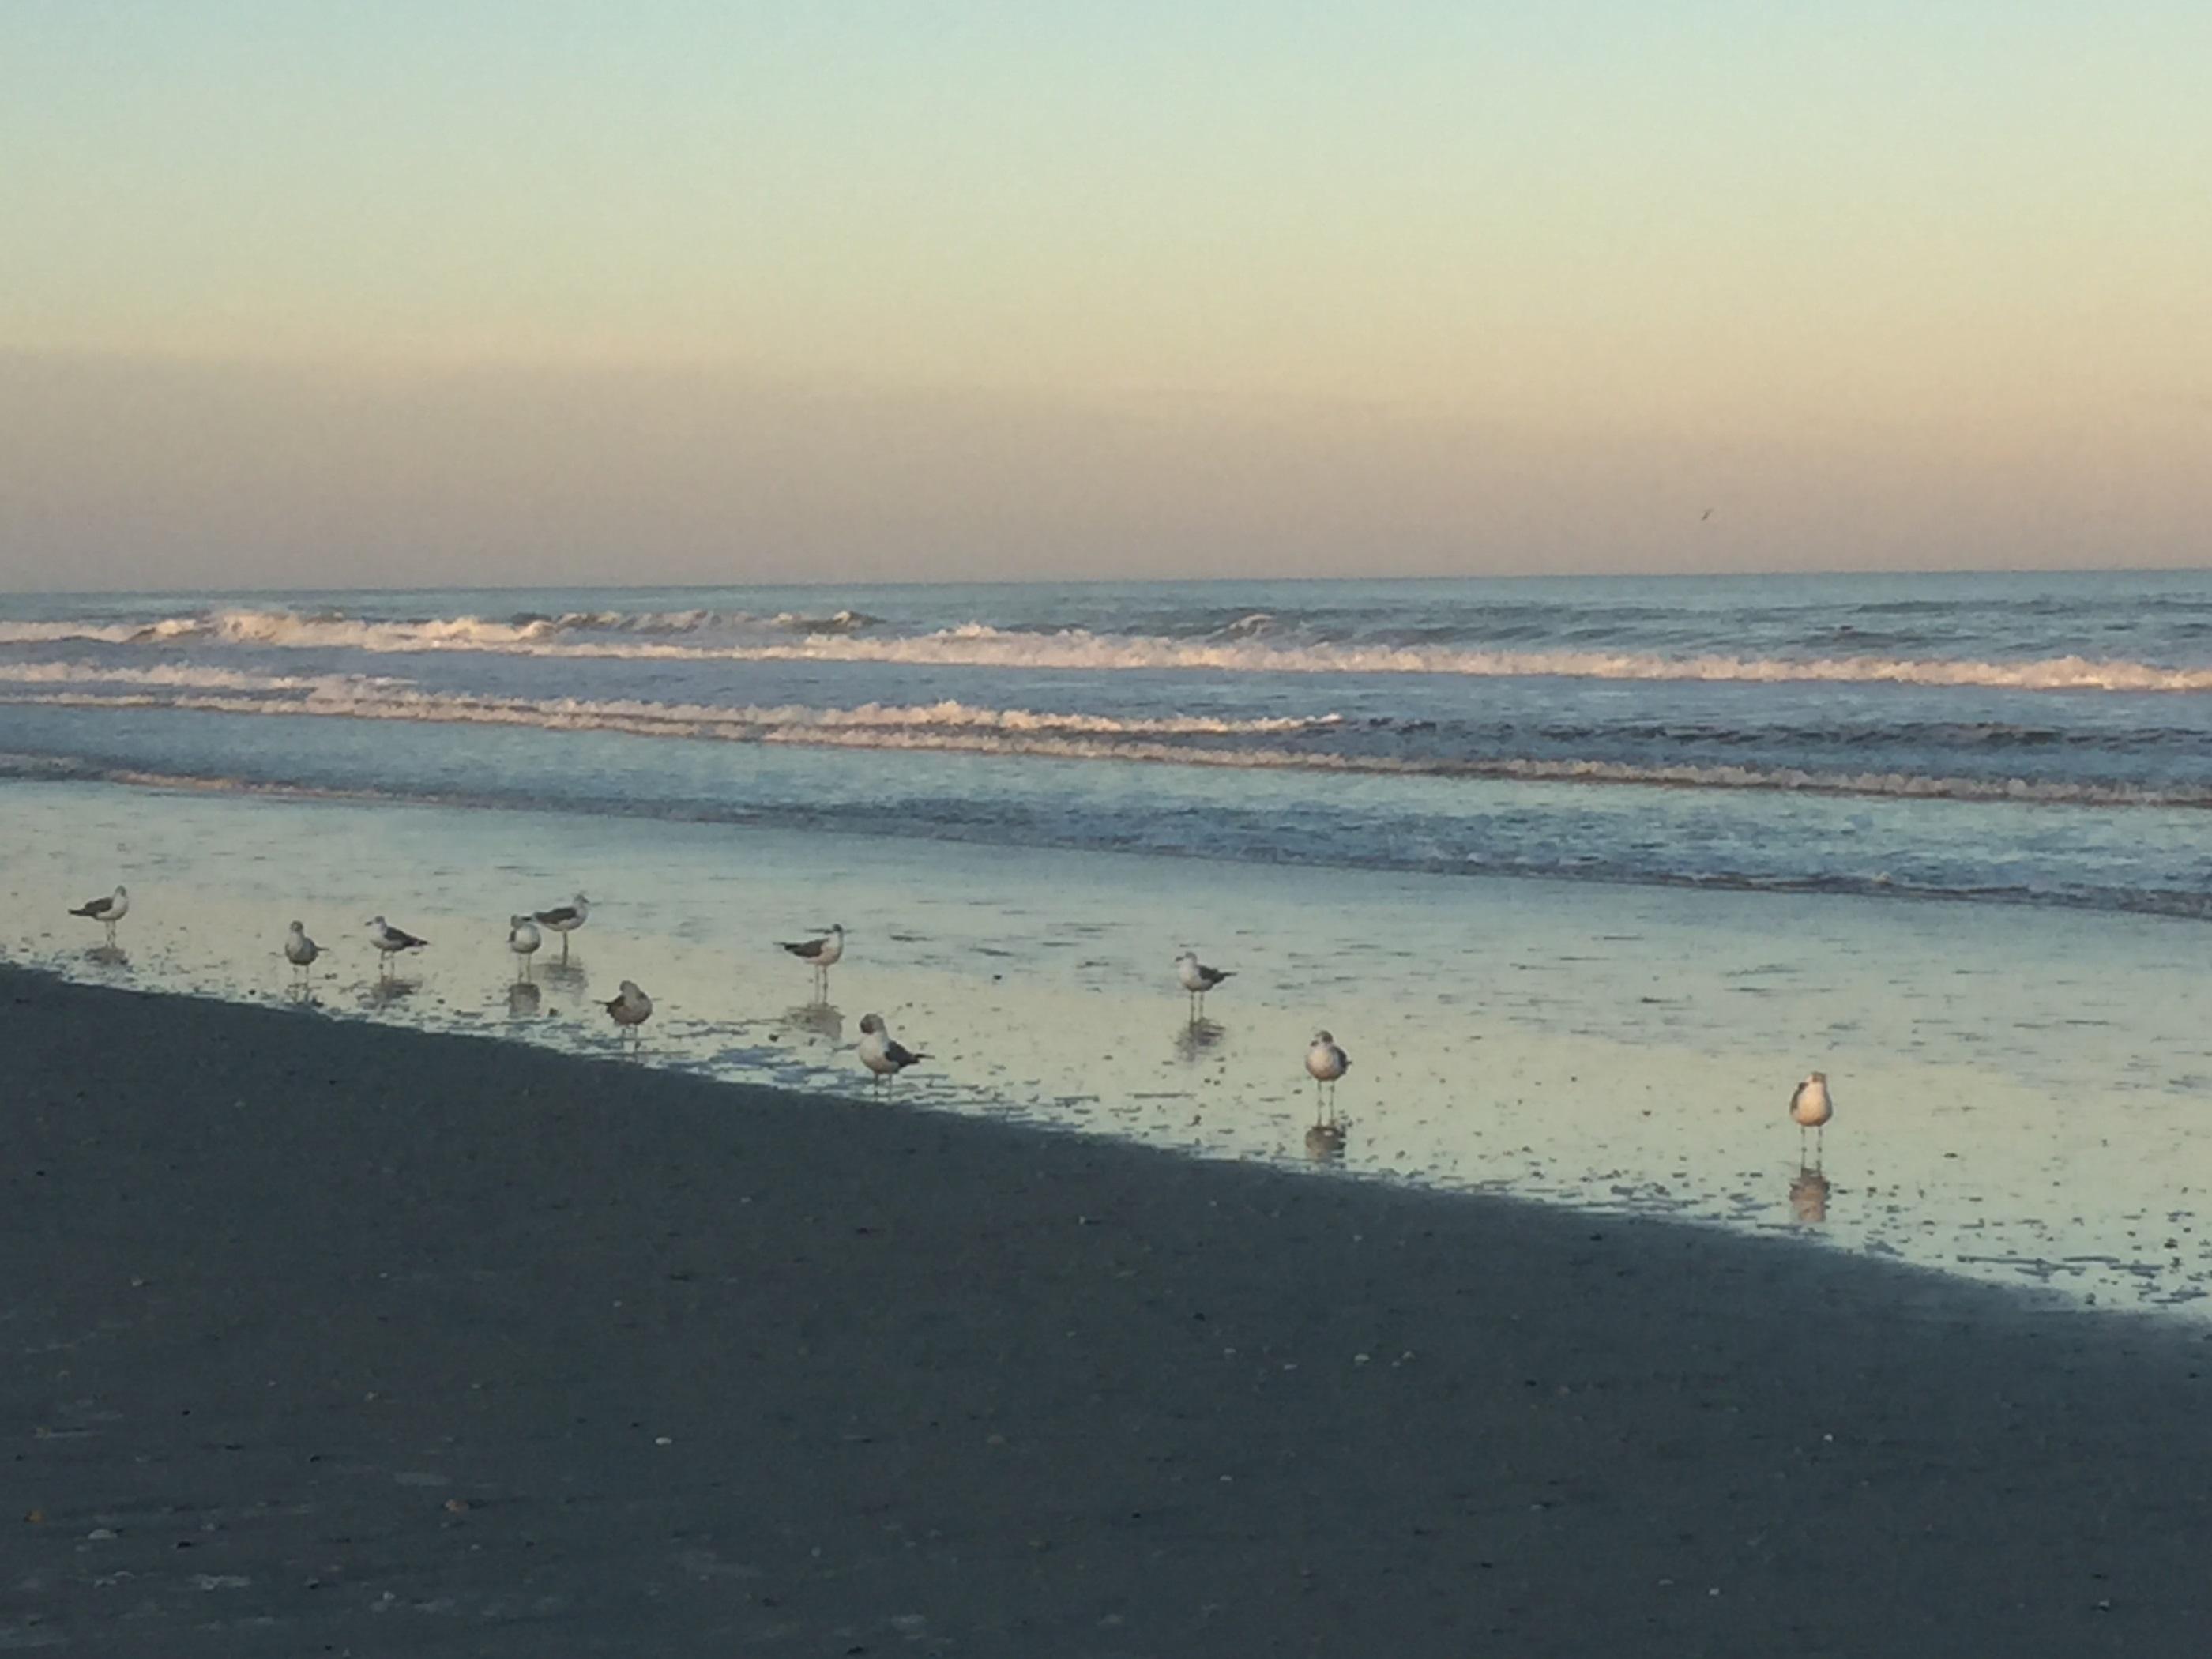 florida u0027s premier oceanfront destination hammock beach resort palm coast florida  rh   floridahomesrealestate